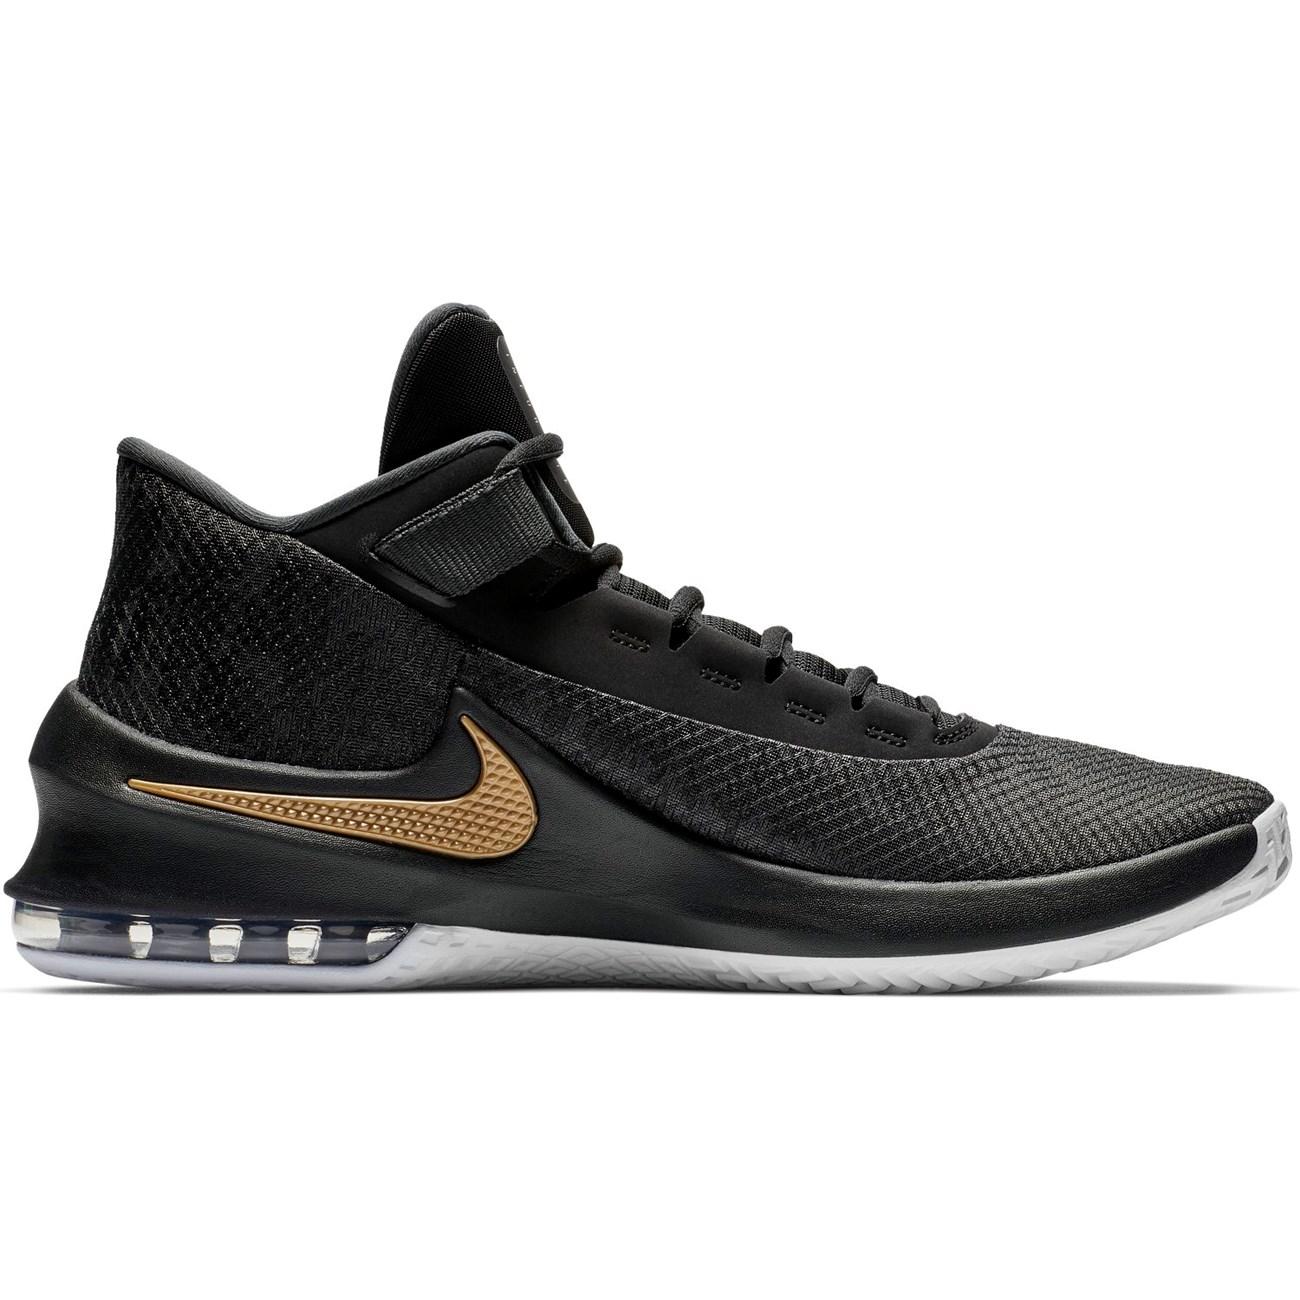 49eed8b0d28 NIKE AIR MAX INFURIATE 2 MID < Παπούτσια Μπάσκετ | INTERSPORT